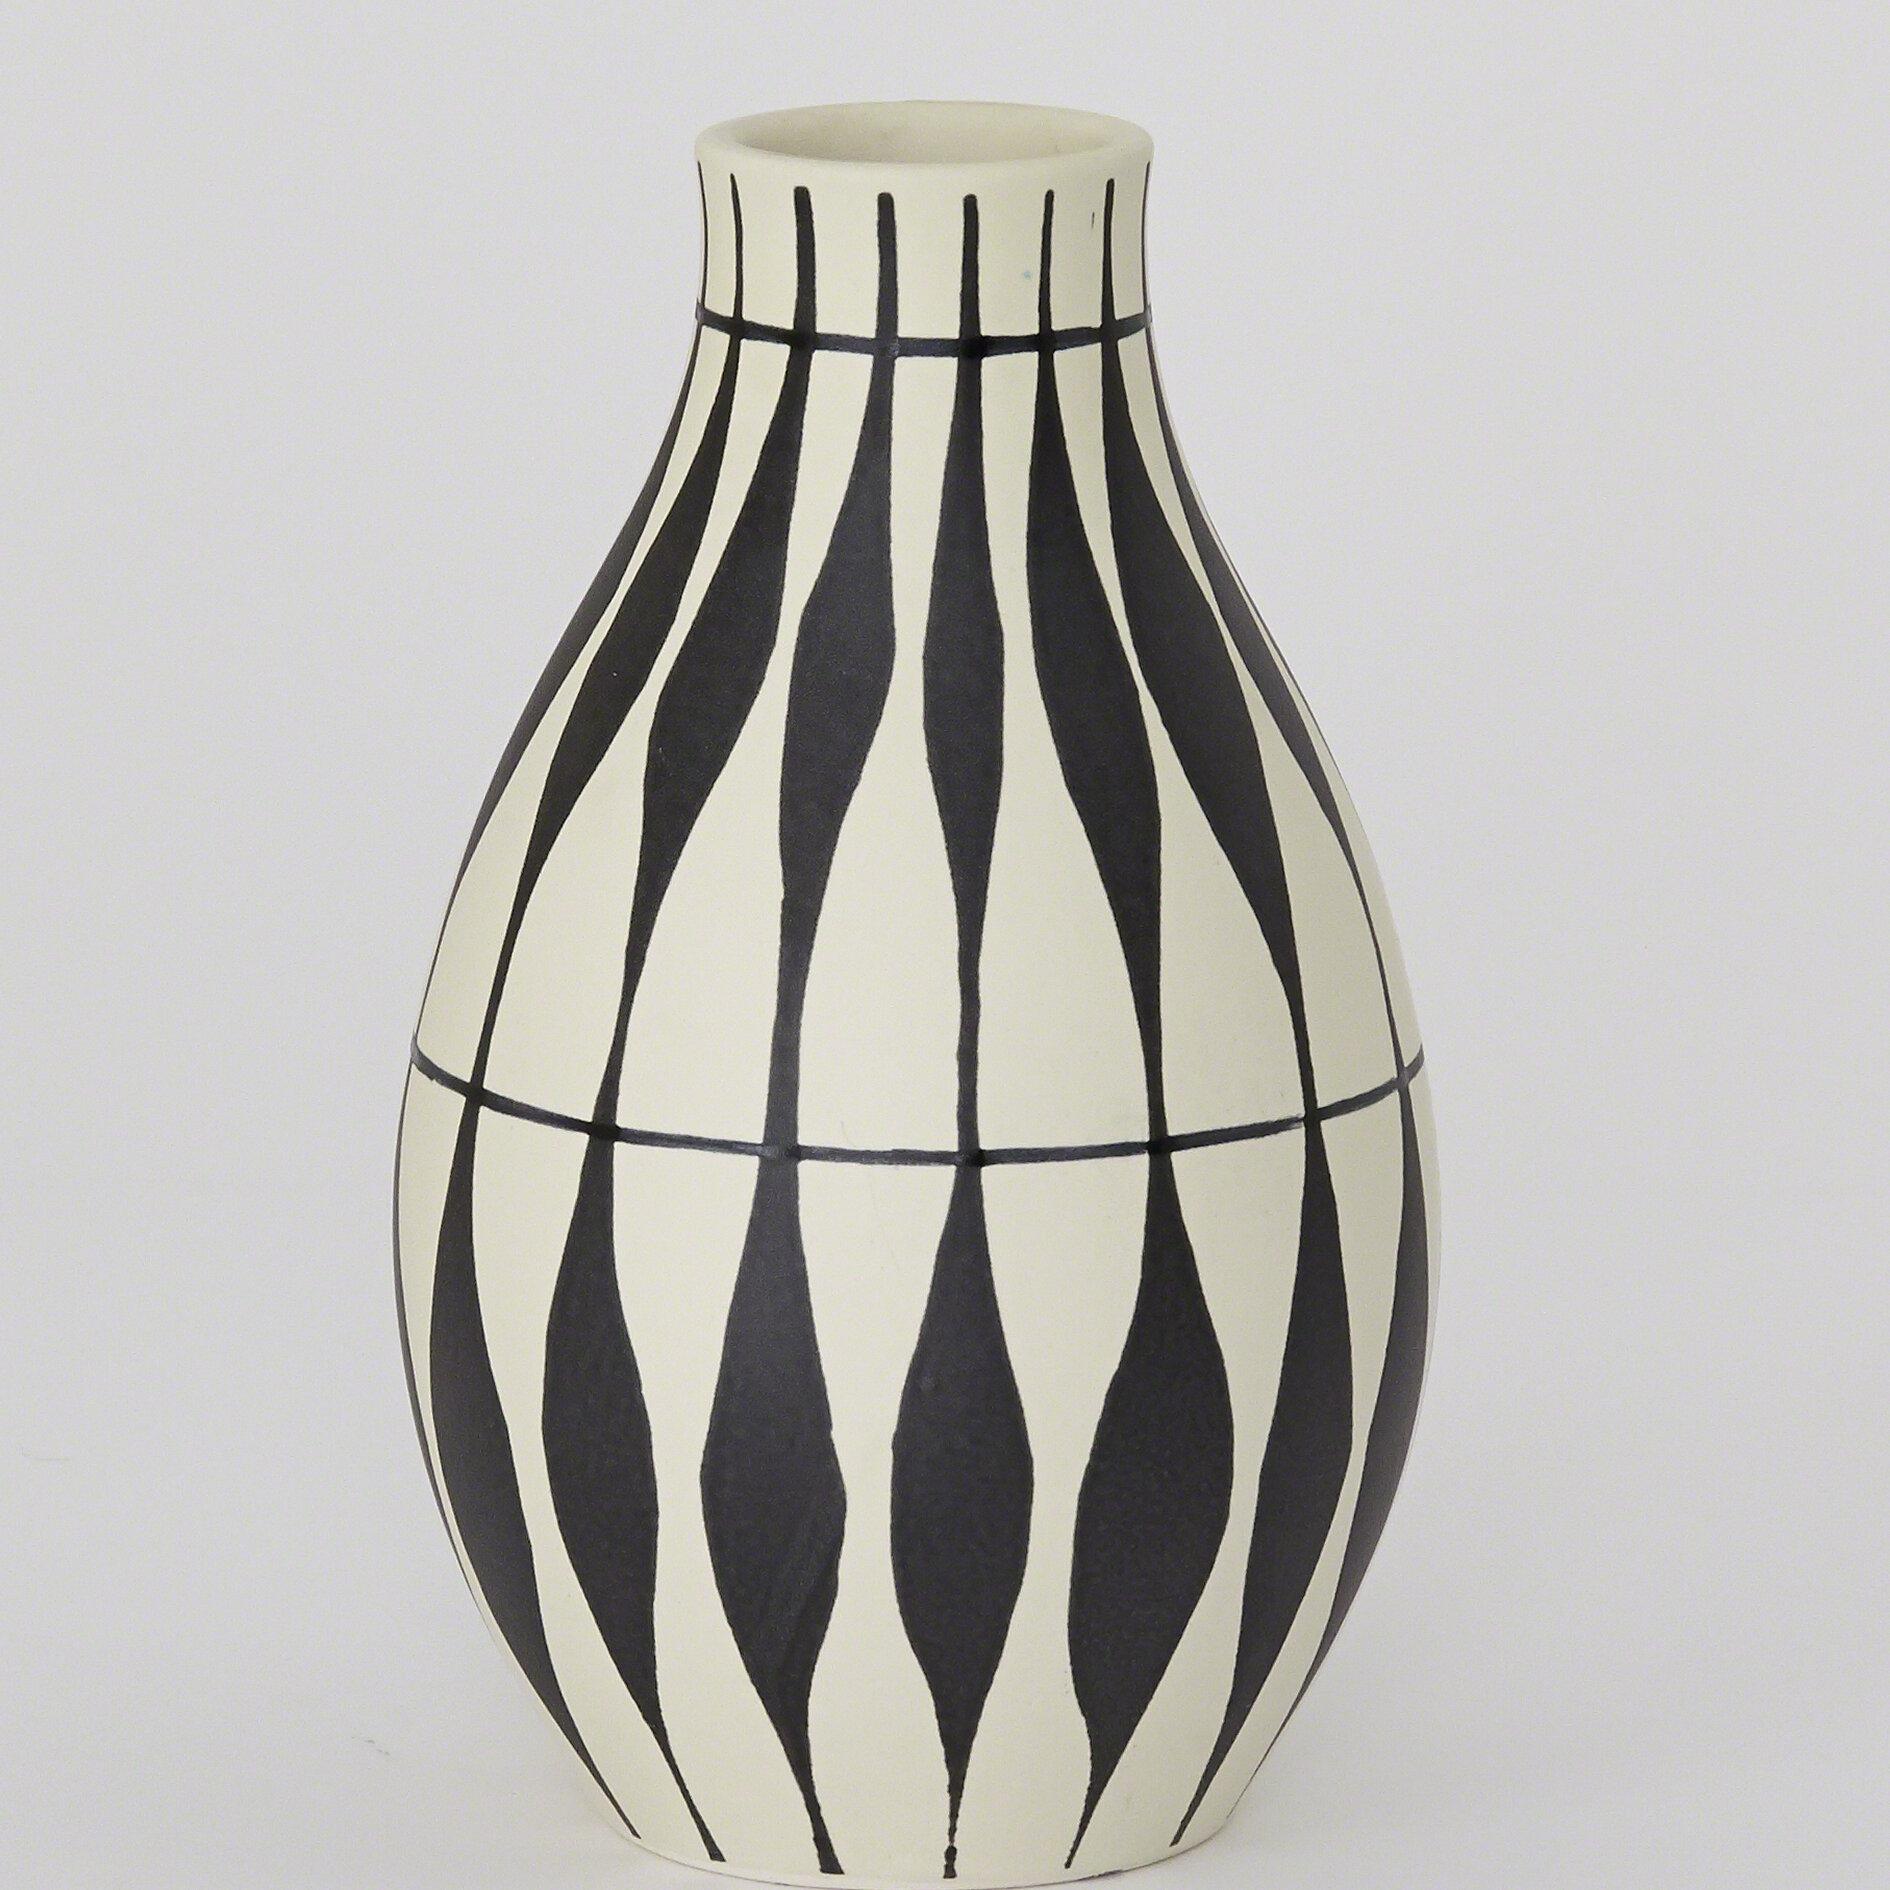 A Pair Vintage Sculptural Handle BlackWhite Ceramic Mid Century Vases